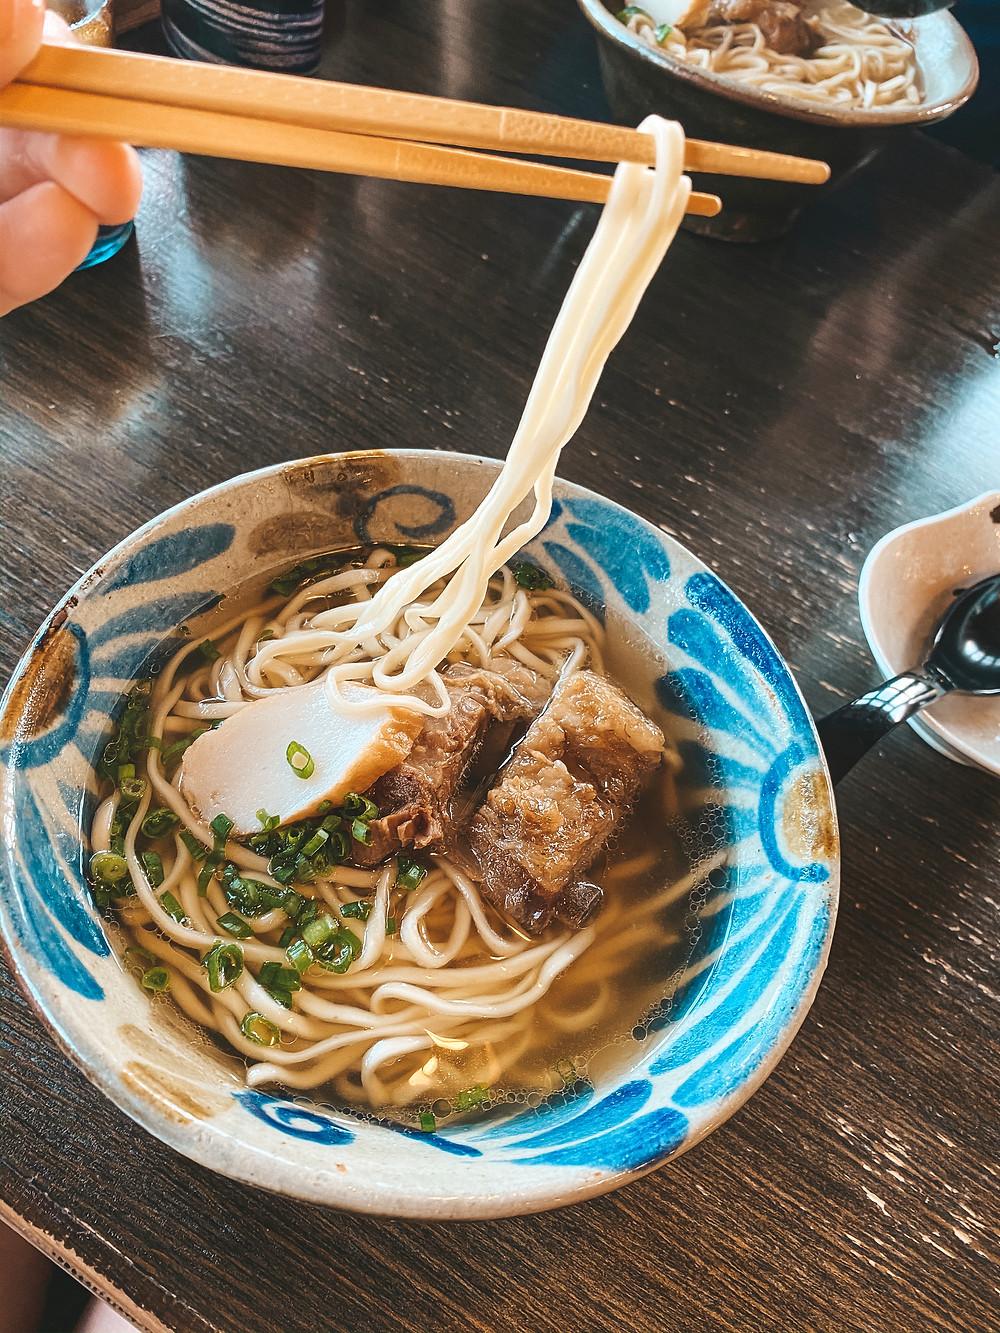 Okinawa Soba Japan noodles